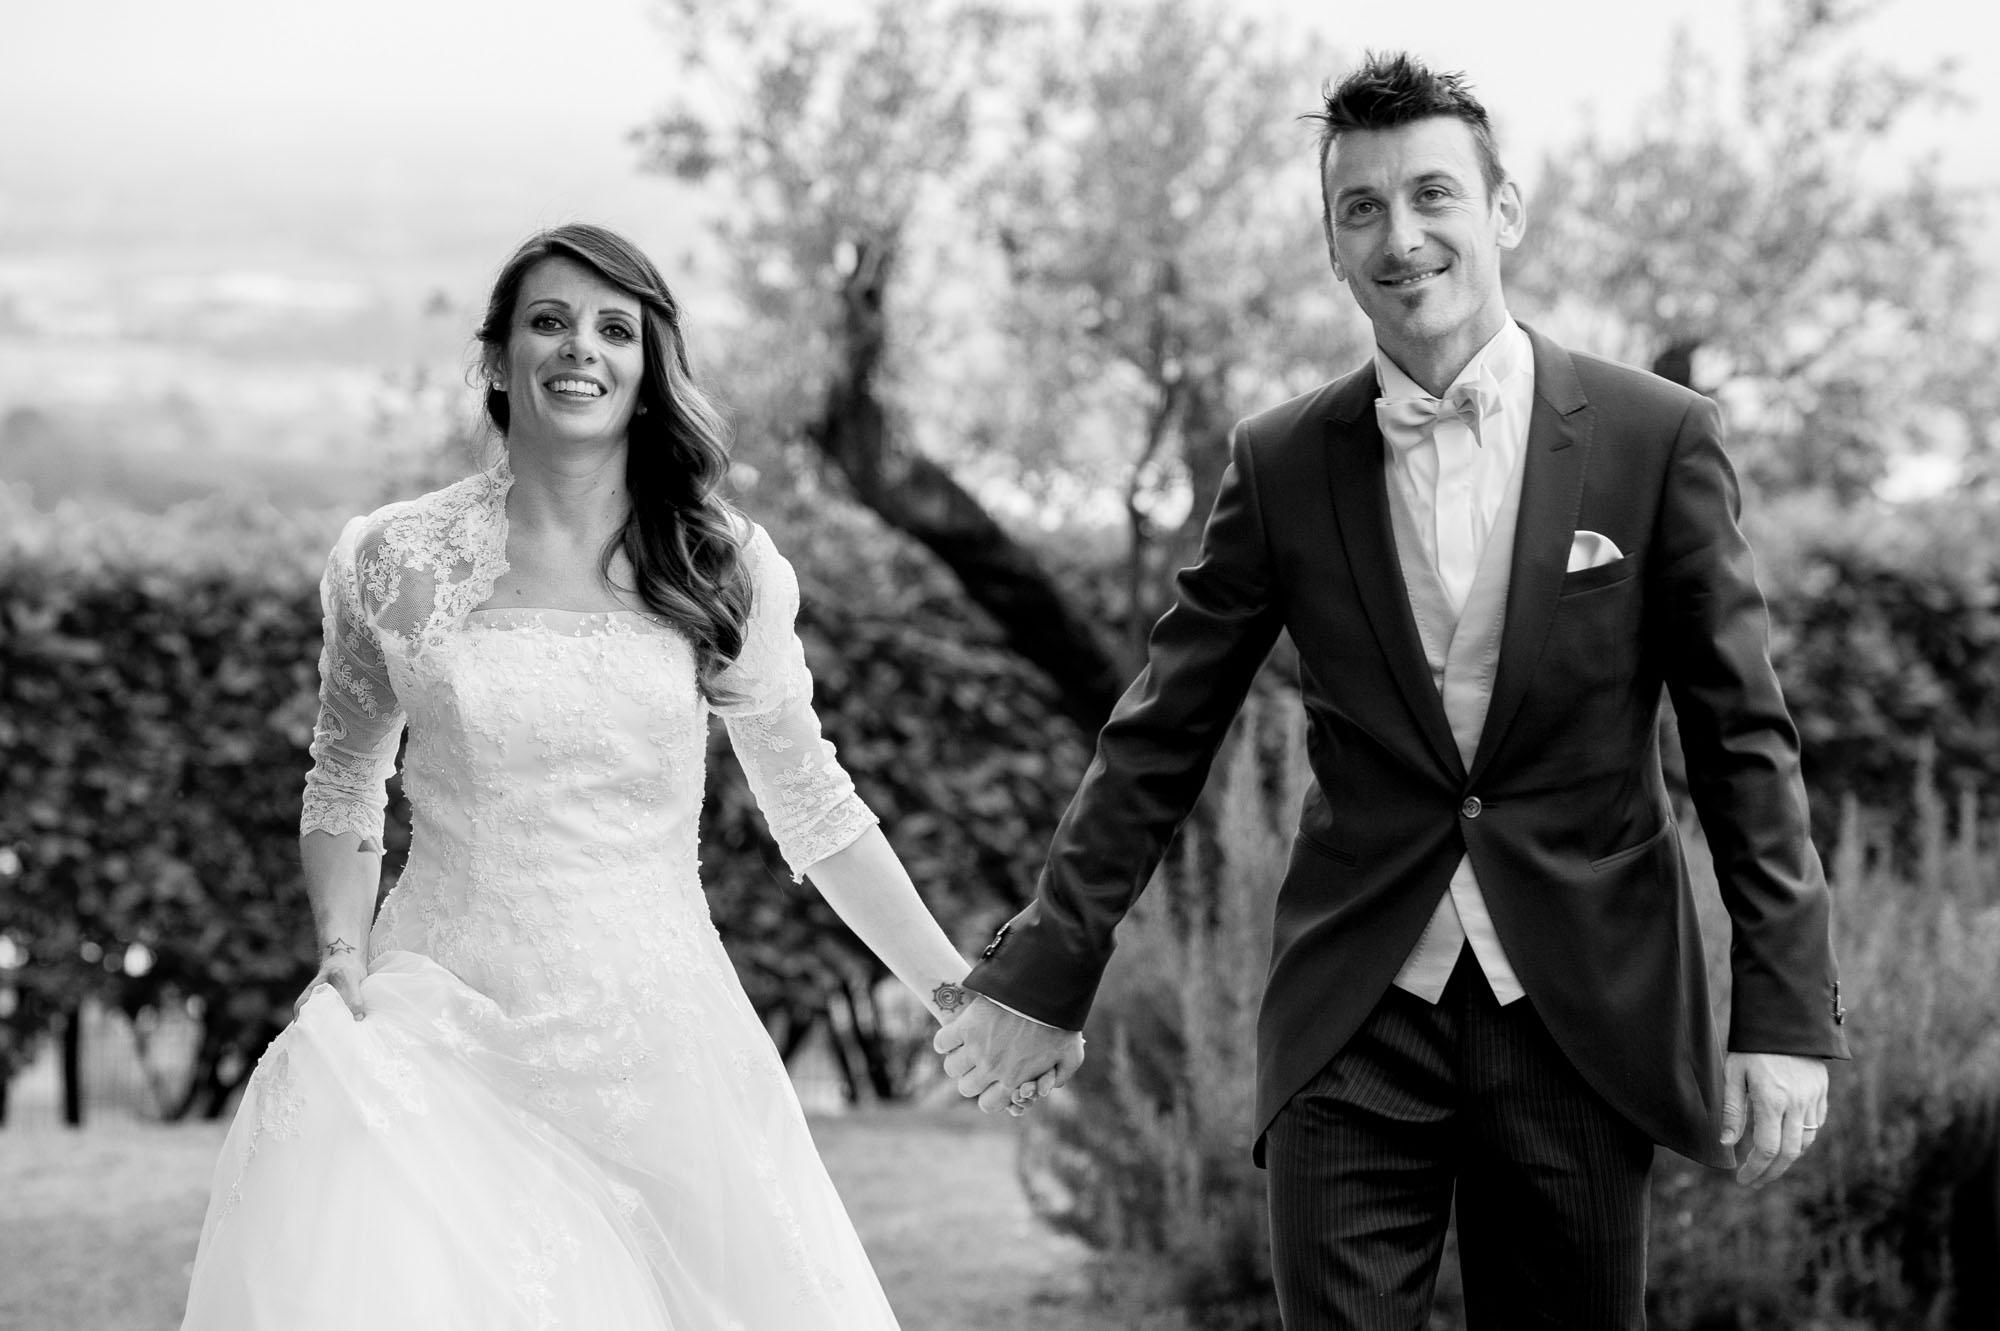 Cristina & Gianpaolo